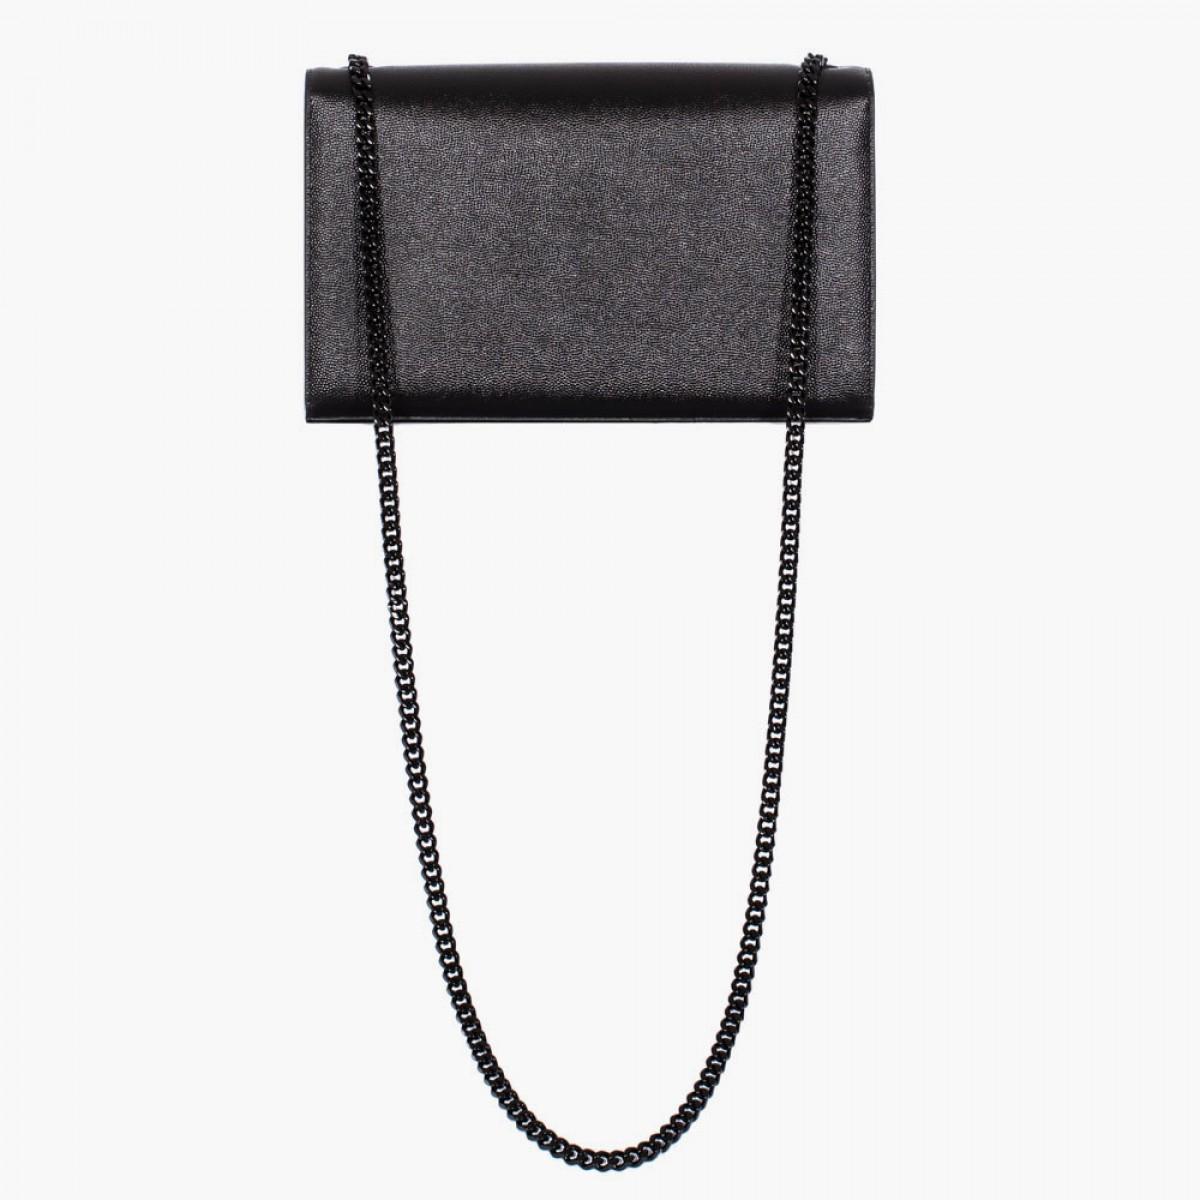 ysl clutch bag - classic small monogram saint laurent camera bag in black grain de ...